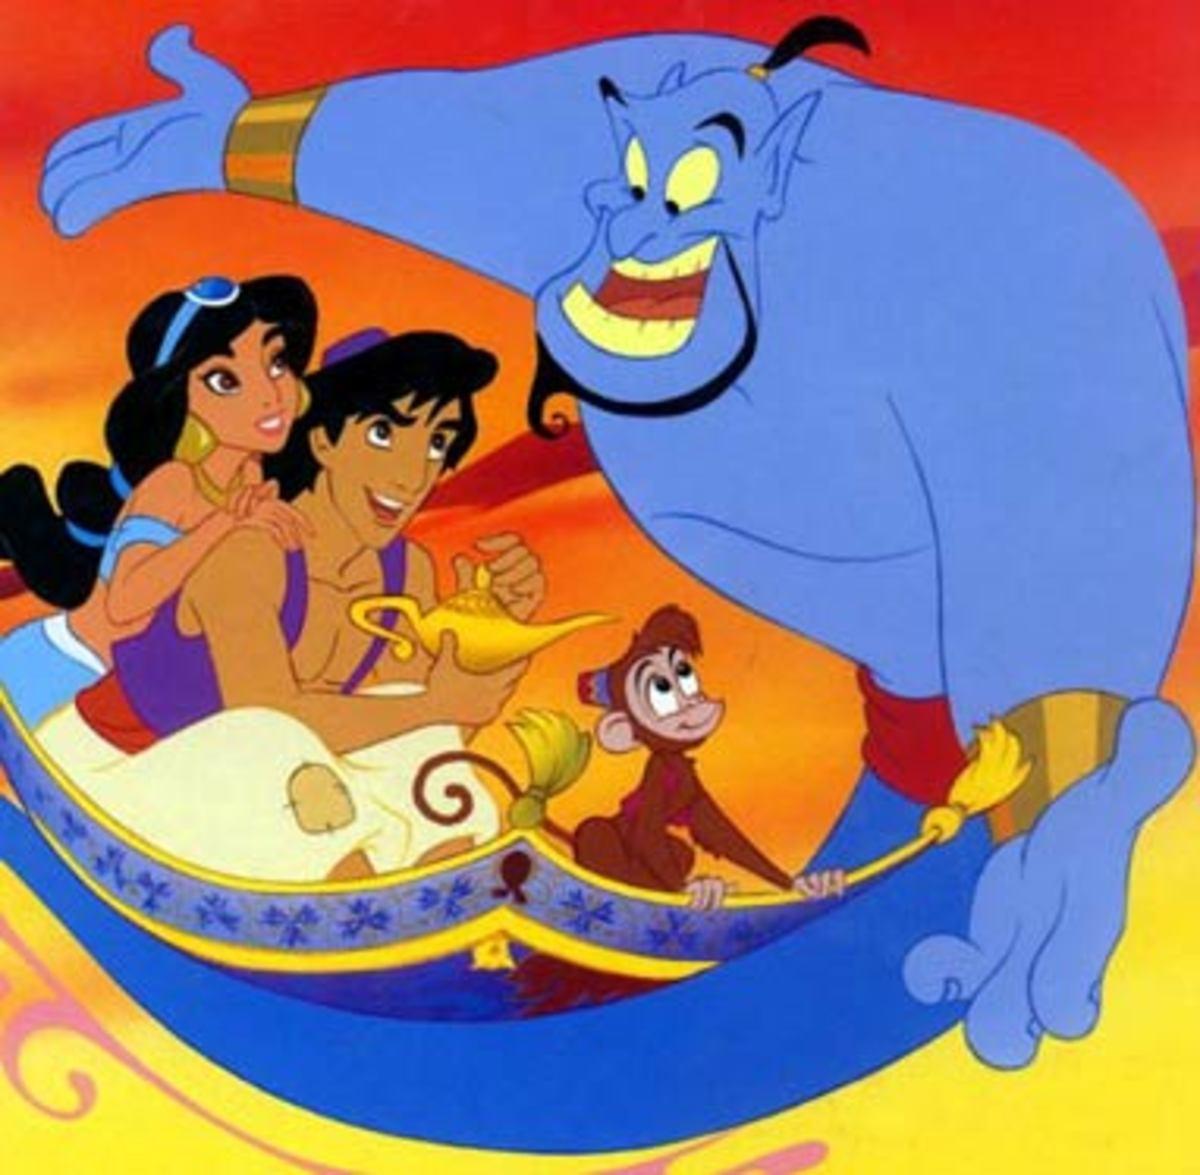 Gender Role Reversal in Disney's Aladdin